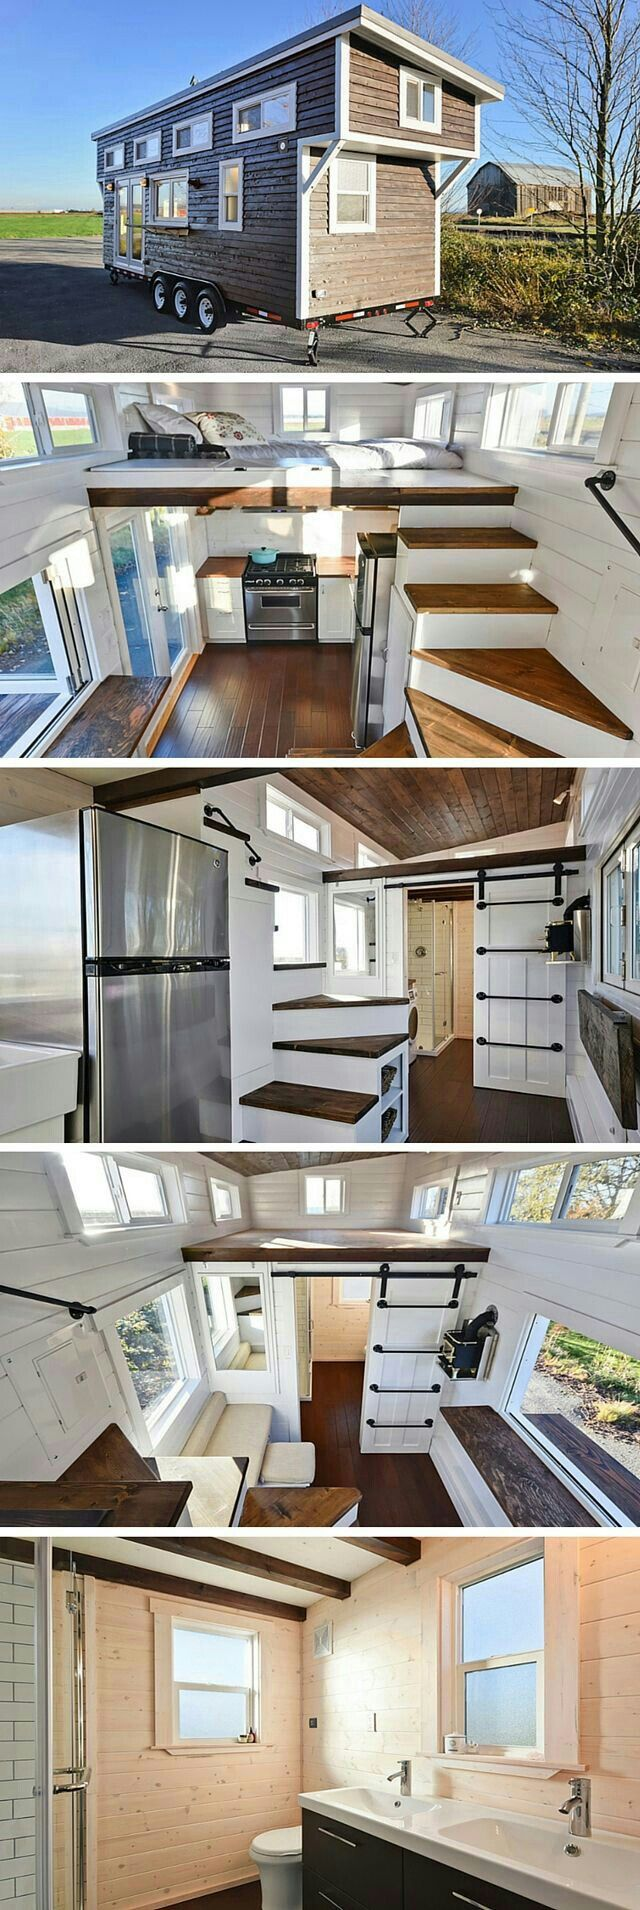 Ideen Fur Dein Tiny Haus Tiny Home Und Mini Haus Tiny House Bauen